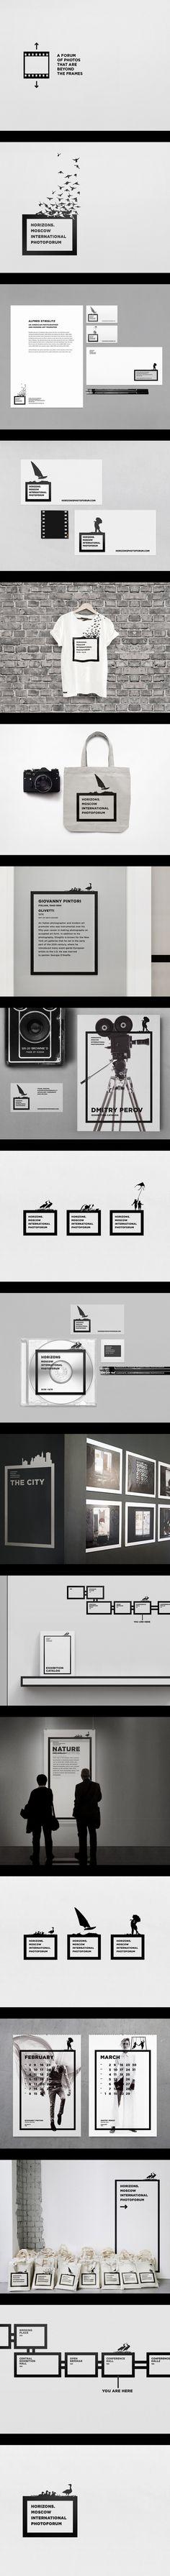 HORIZONS by Vova Lifanov, via Behance